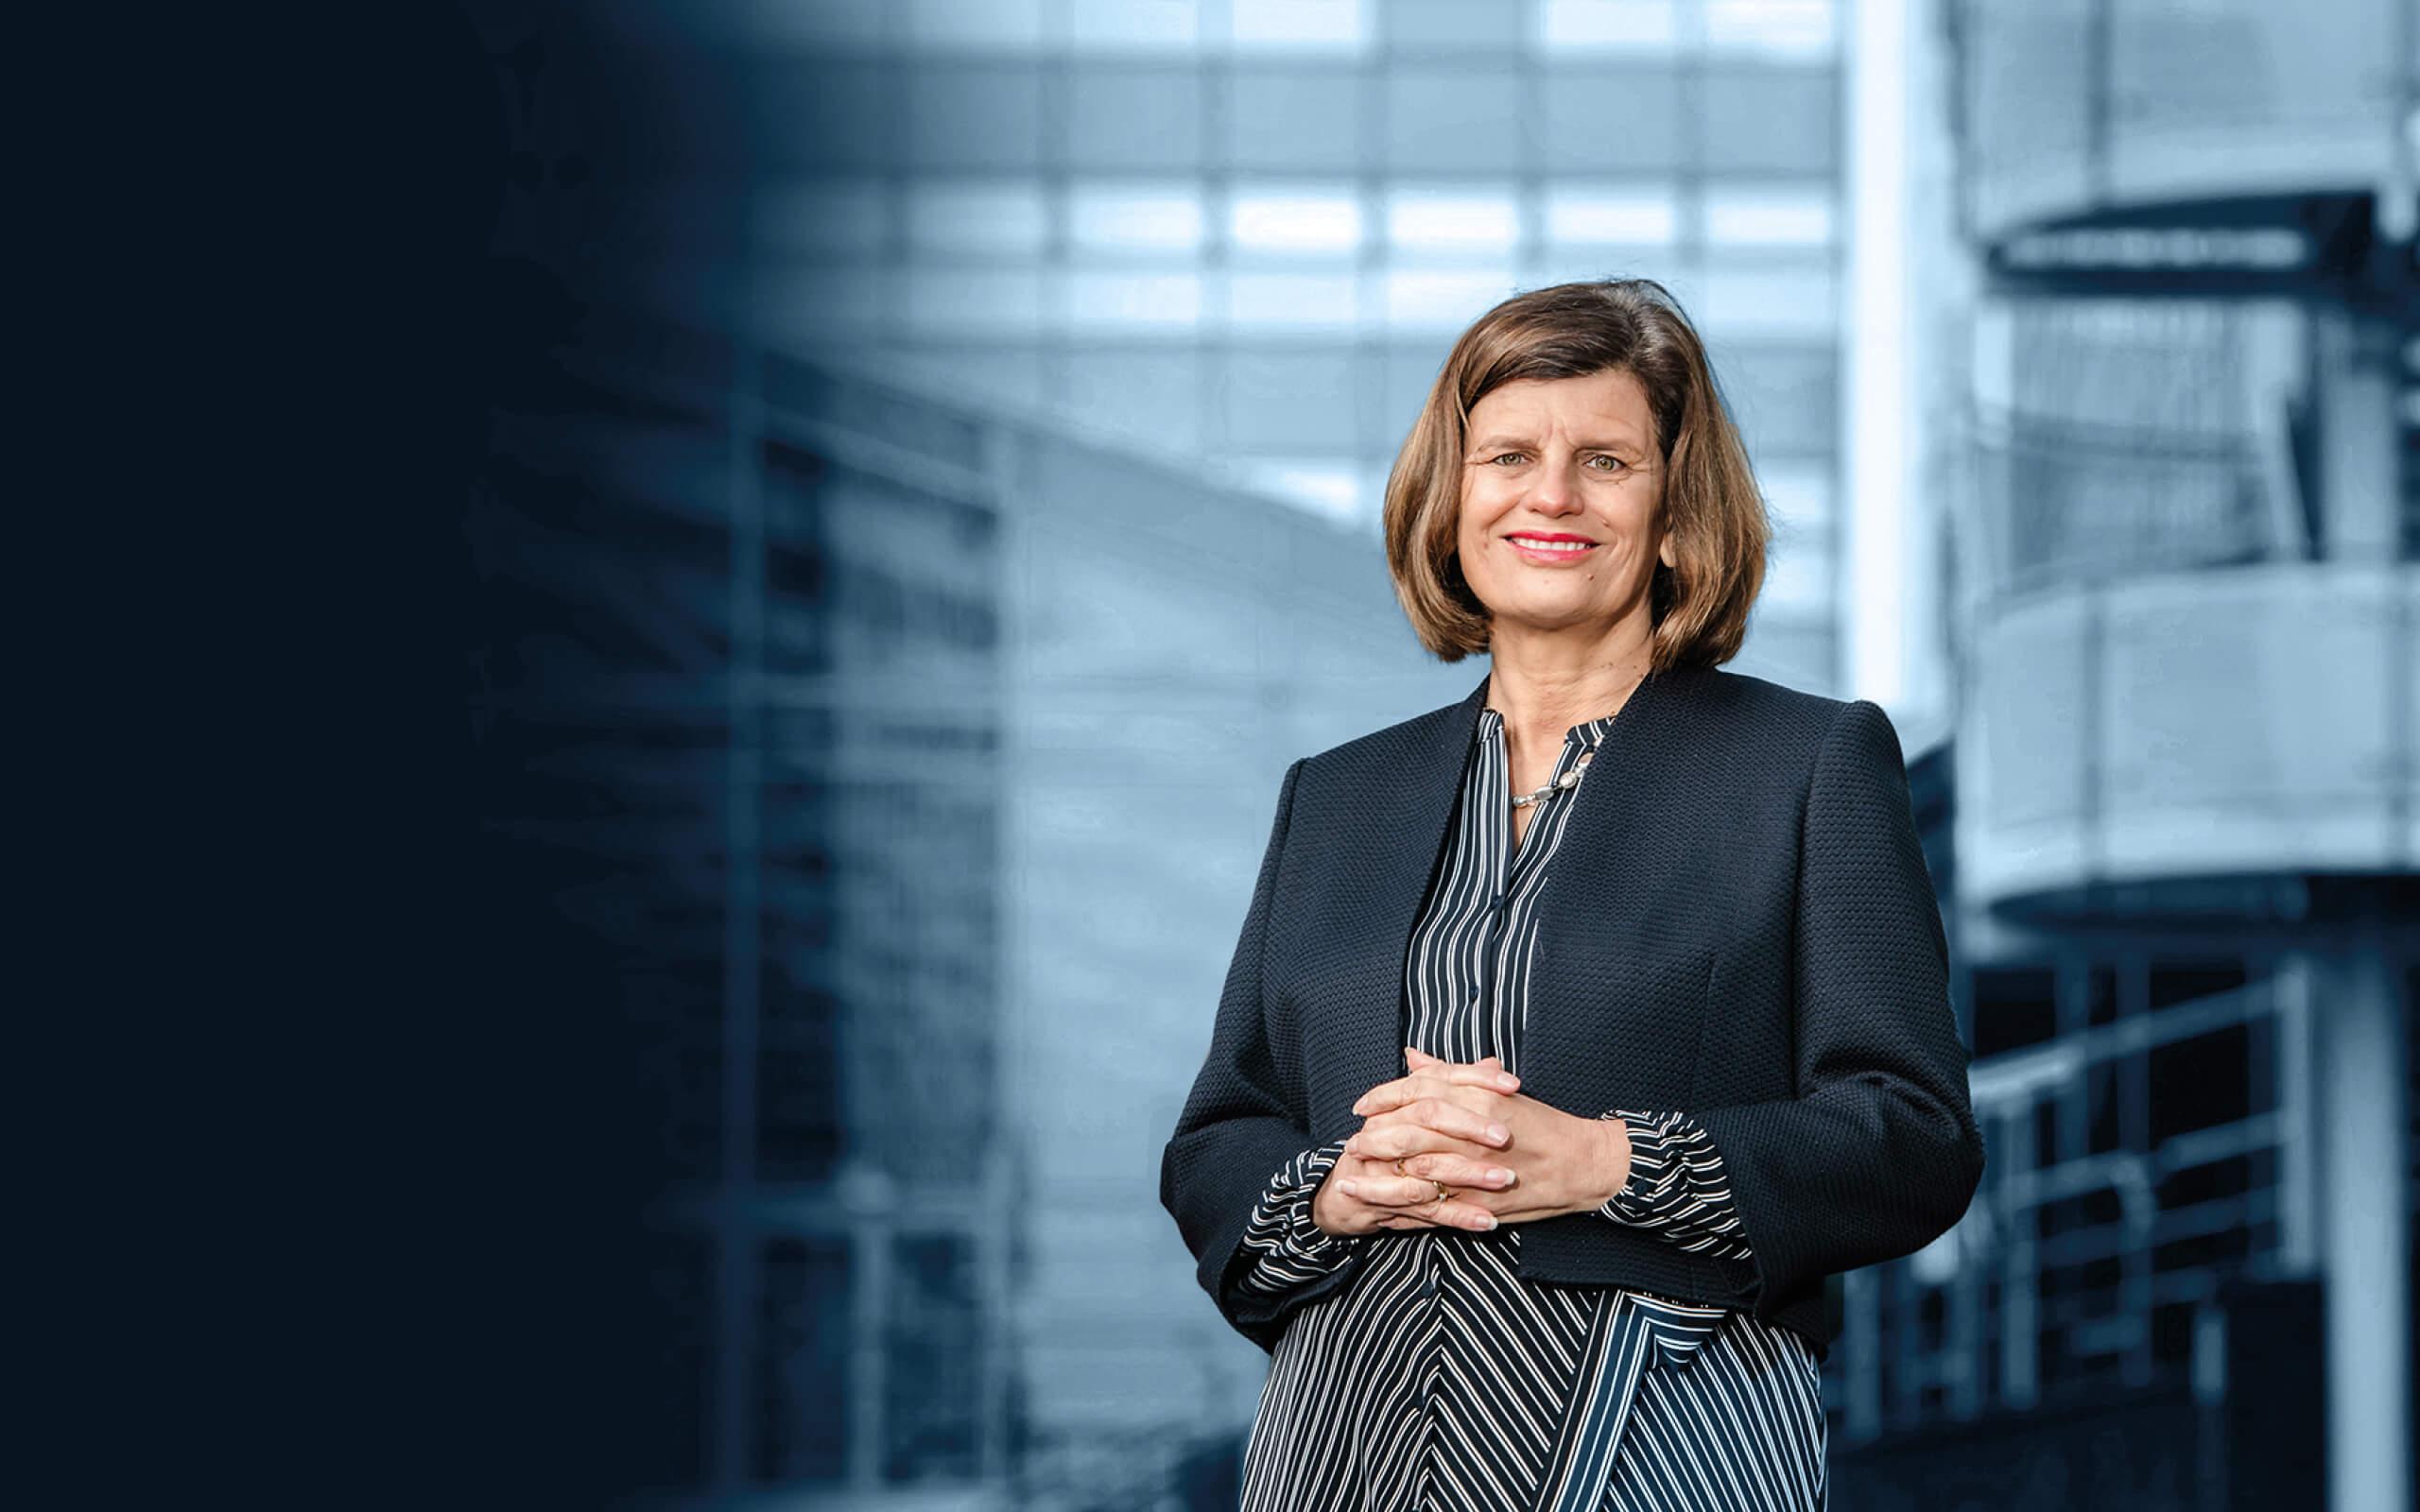 Professor Kathryn Mitchell, Vice-Chancellor